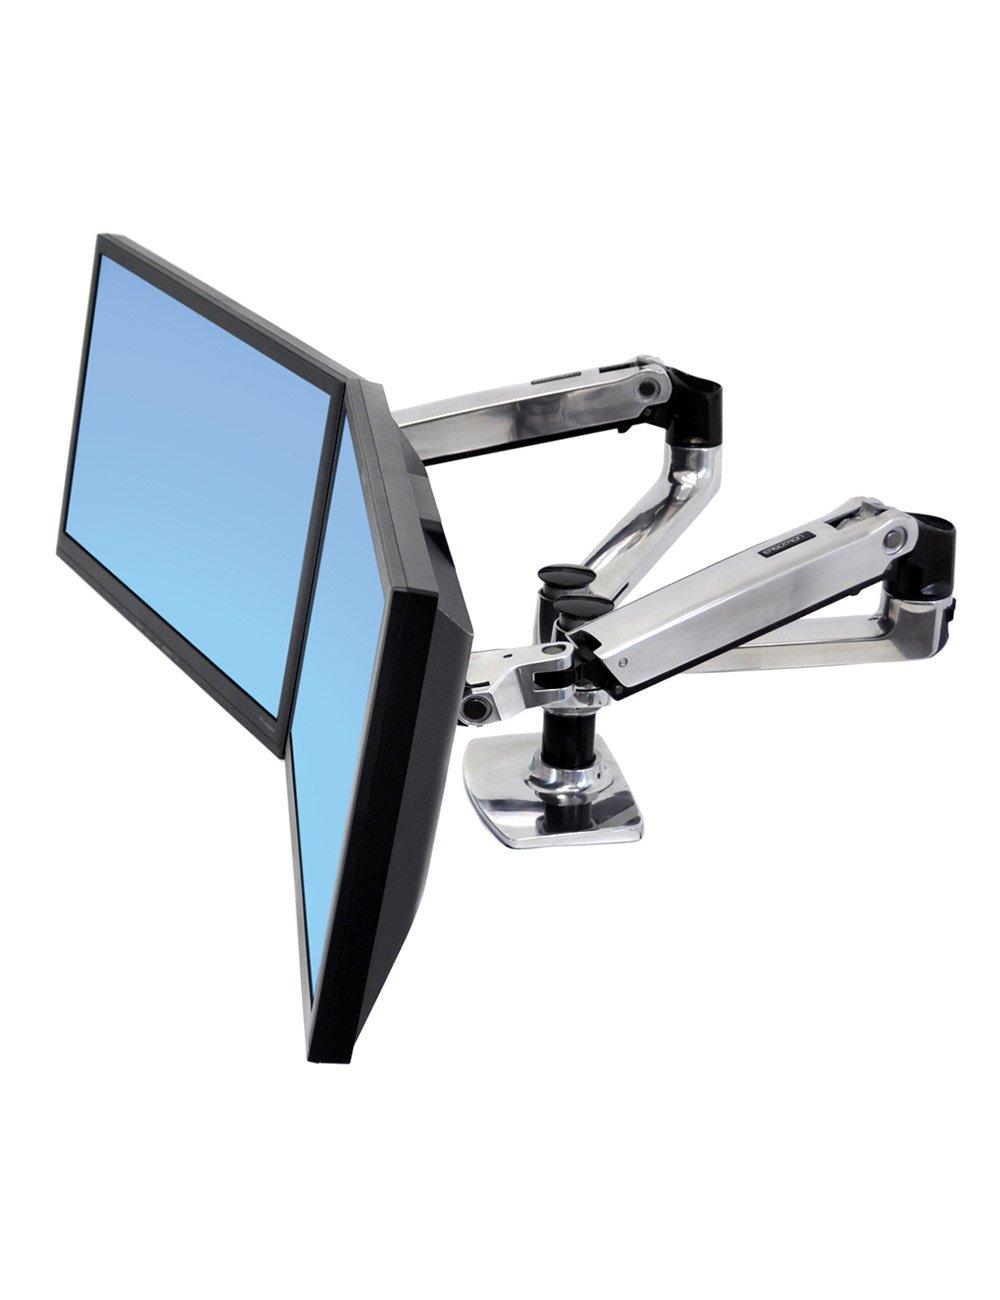 Ergotron Lx Dual Desk Mount Arm Online Ergonomics